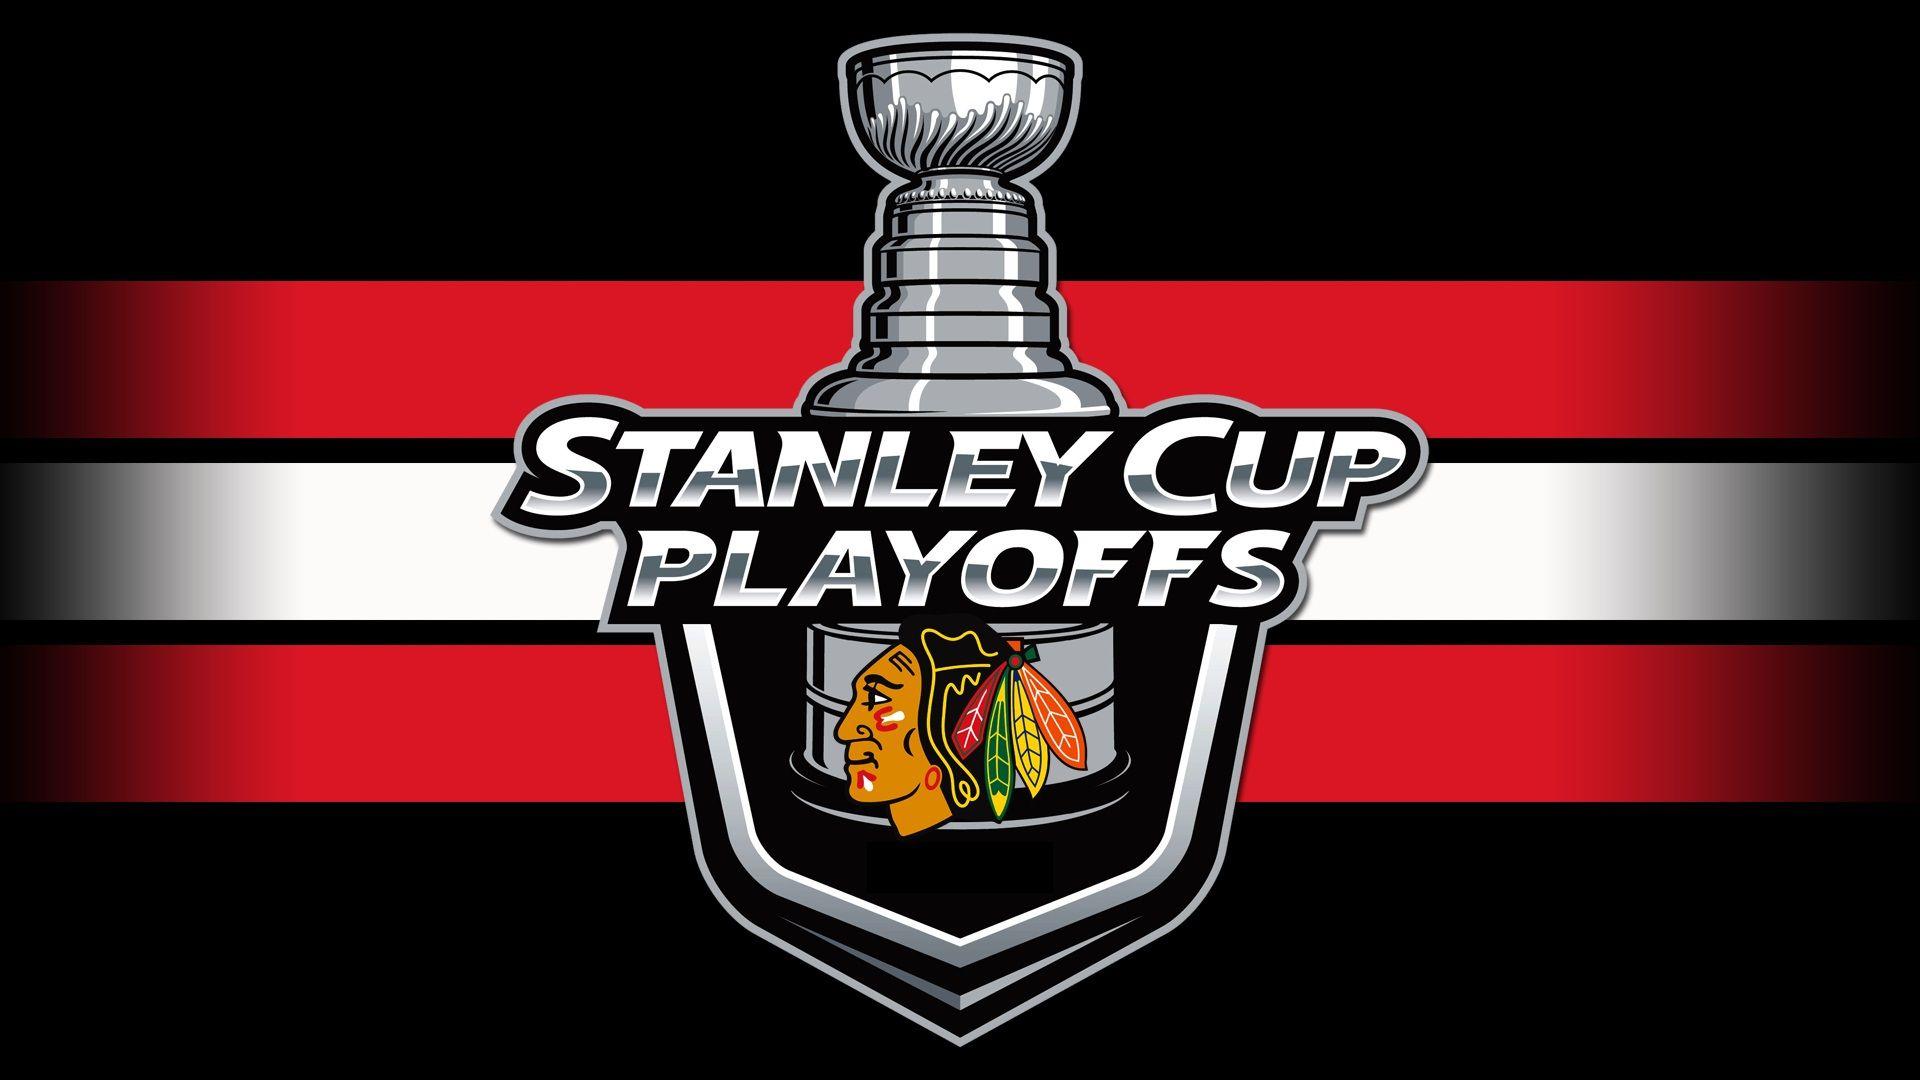 Live Wallpaper Hd Chicago Blackhawks Wallpaper Chicago Blackhawks Blackhawks Stanley Cup